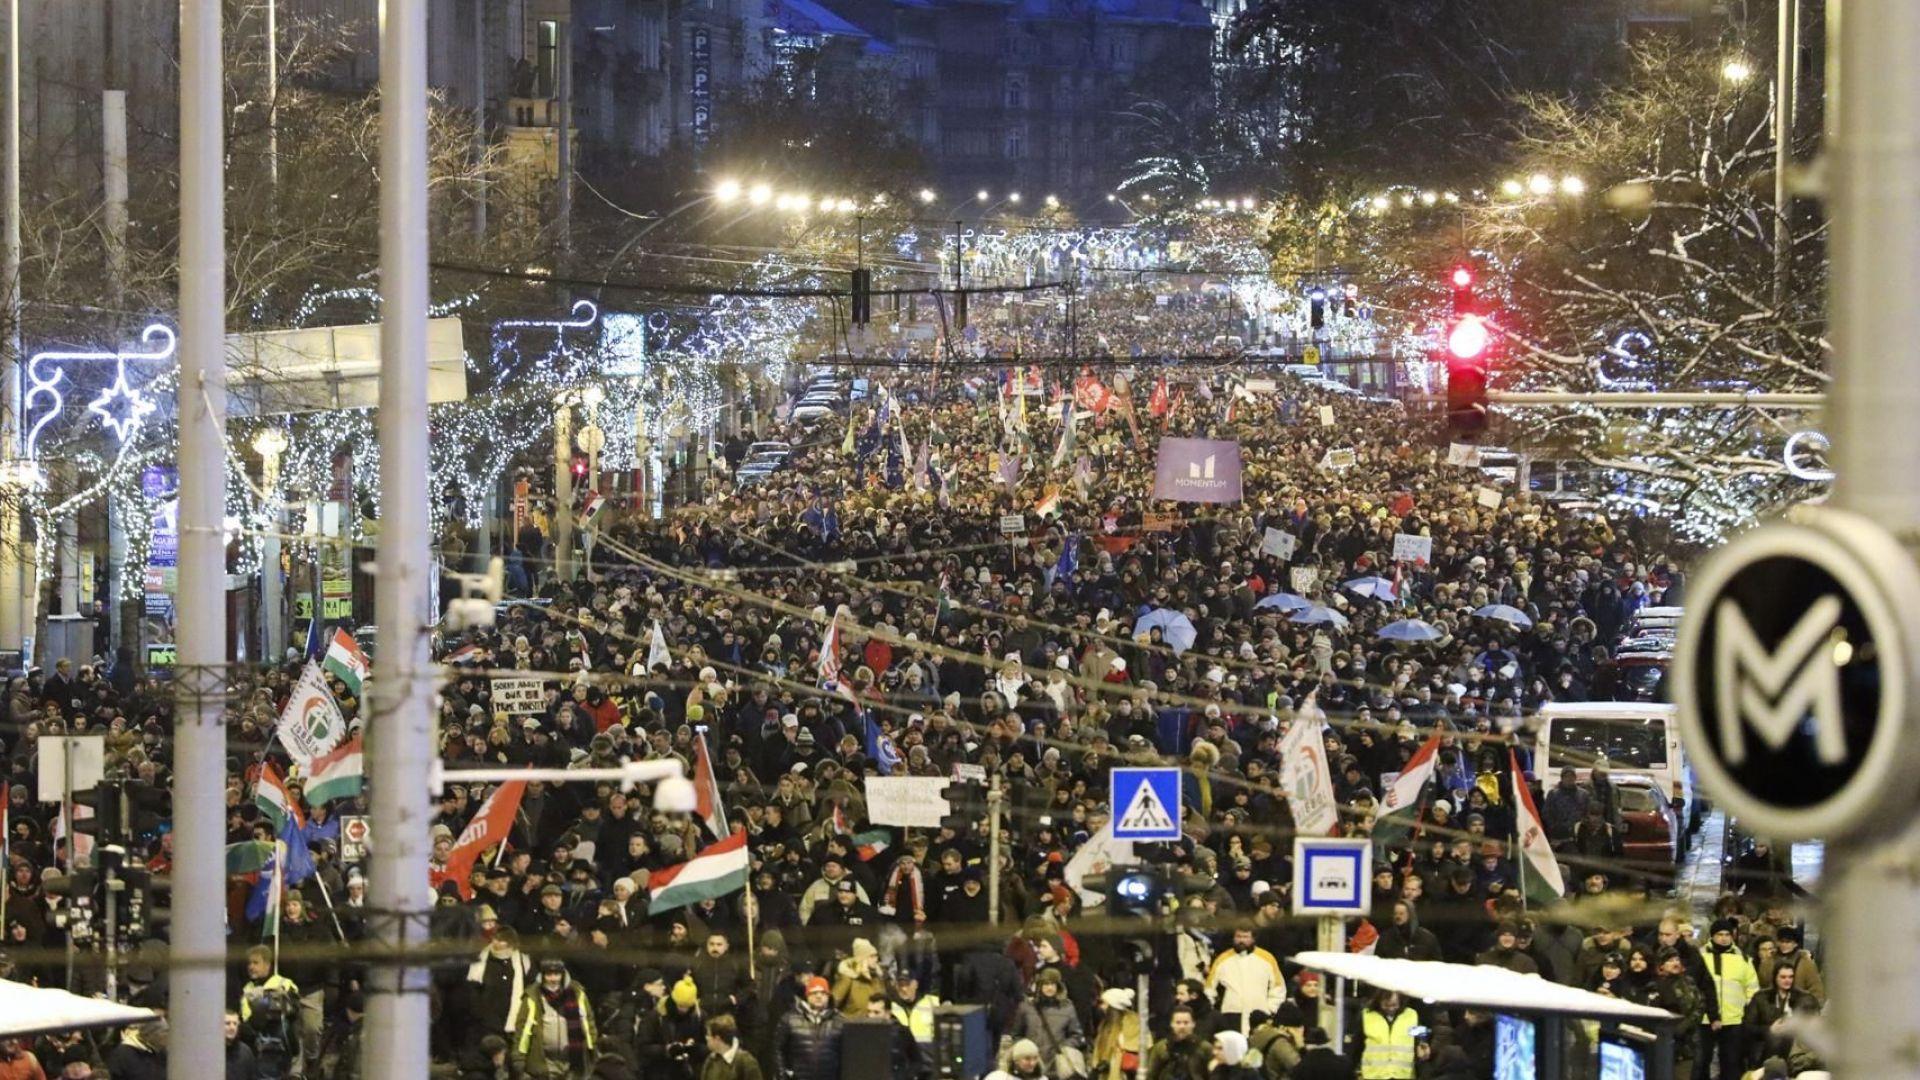 Хиляди унгарци протестираха днес в Будапеща срещу нов трудов закон